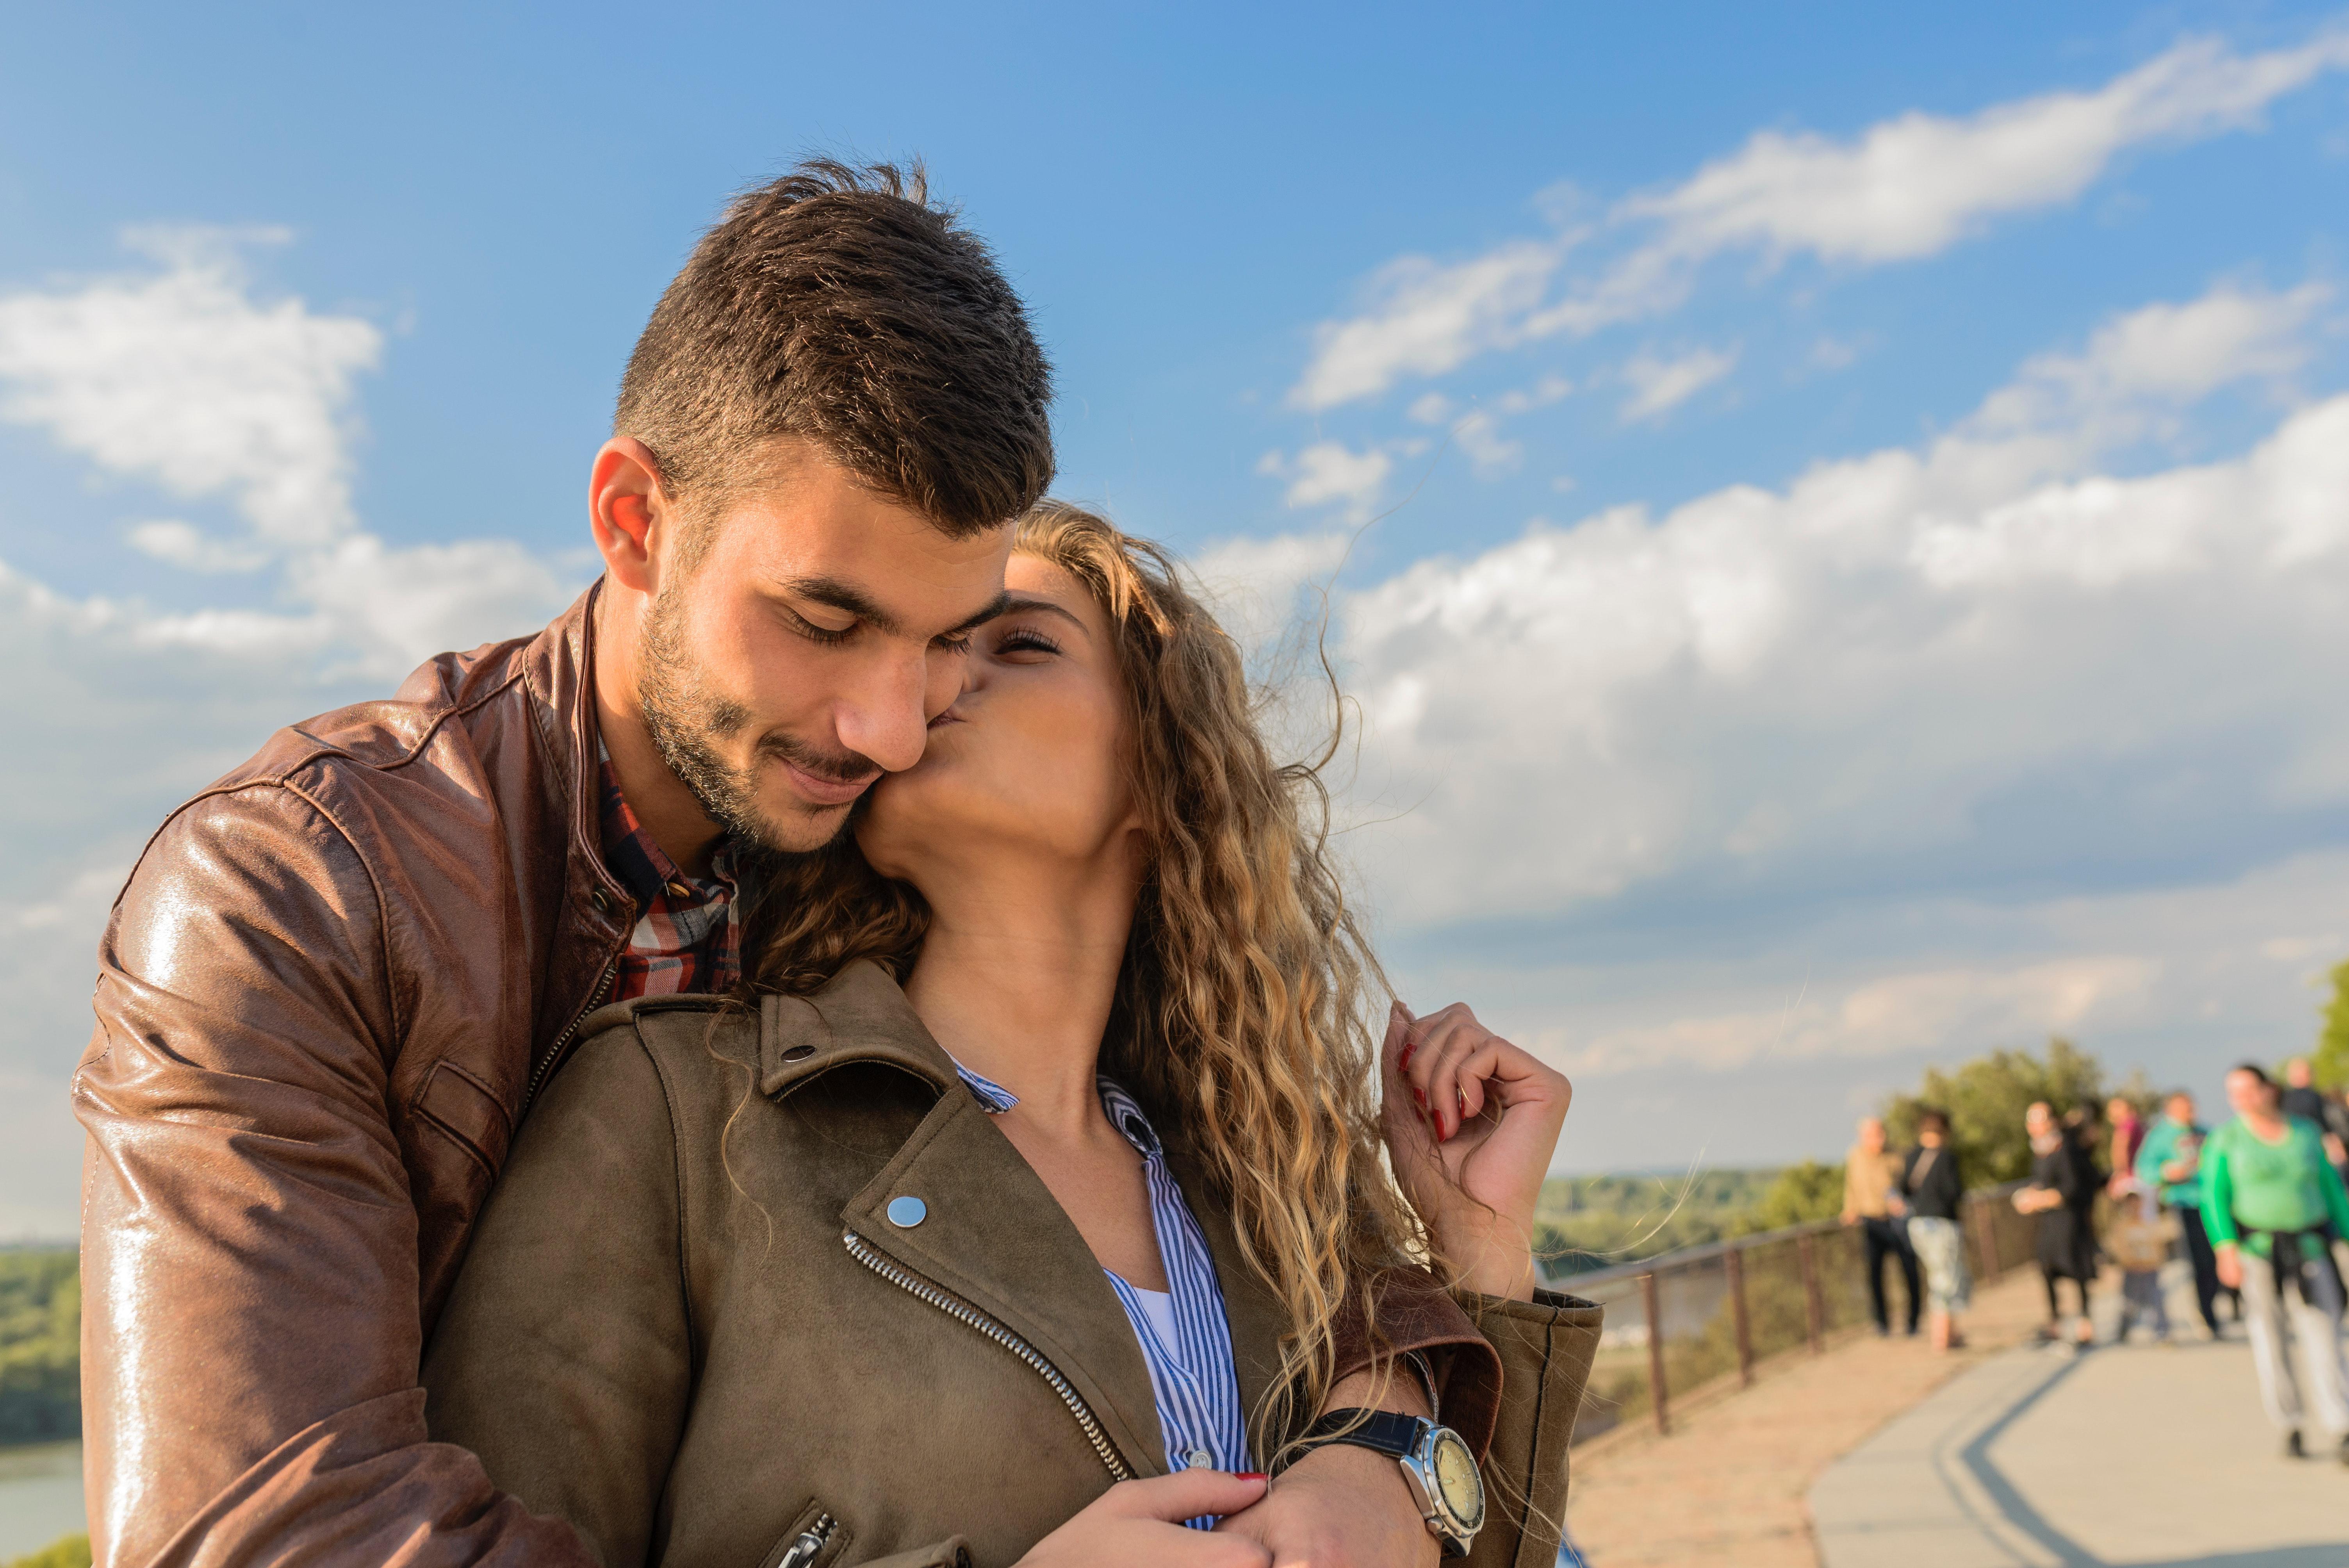 Speed dating roma locali